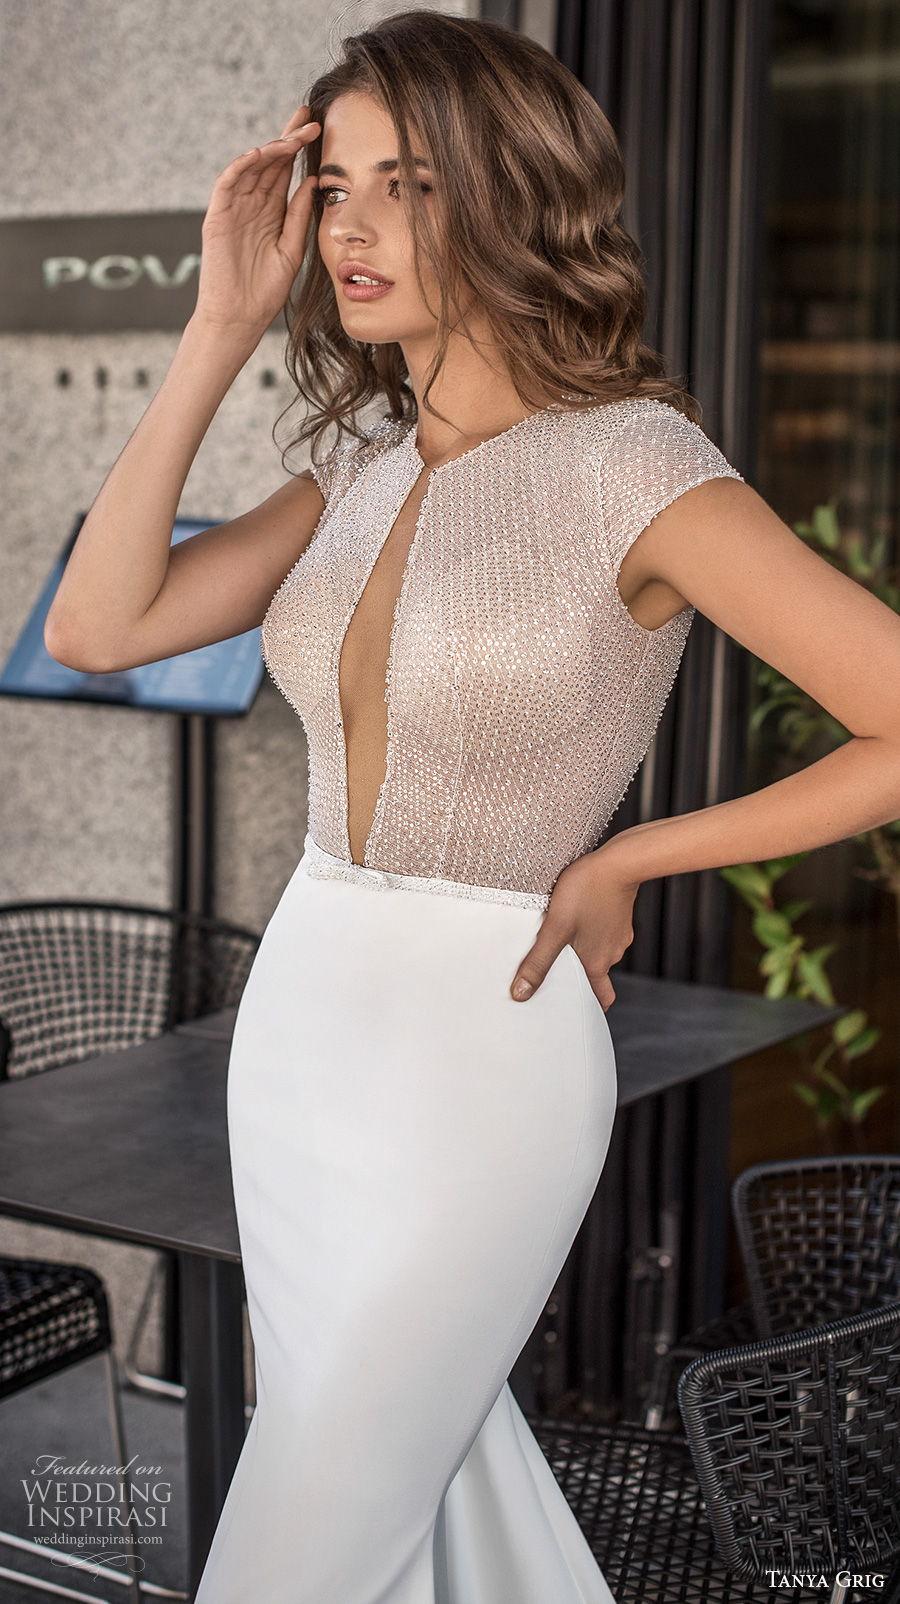 tanya grig 2021 bridal cap sleeves jewel keyhole bodice glamorous sexy fit and flare wedding dress keyhole low back medium train (2) zv